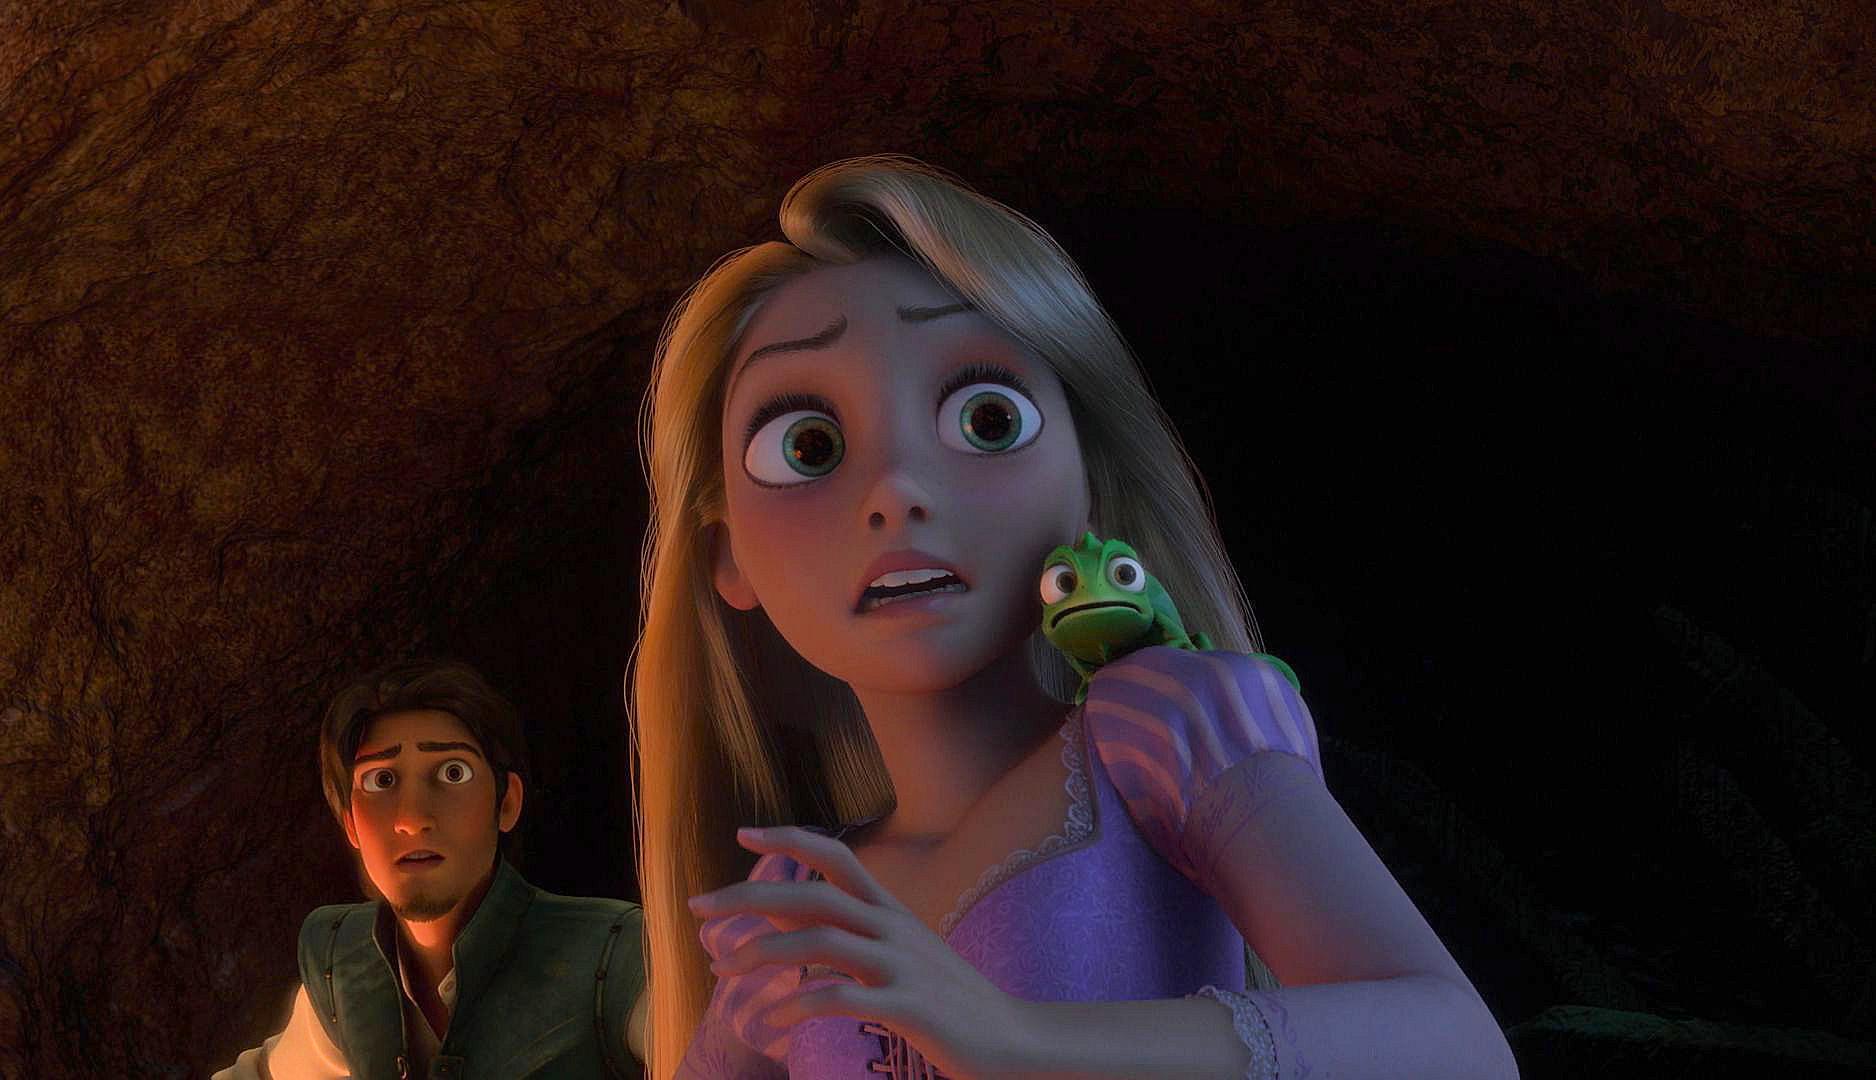 Screencaps(Tangled) - Rapunzel and Flynn Image (21862405 ... Disney Rapunzel Screencaps